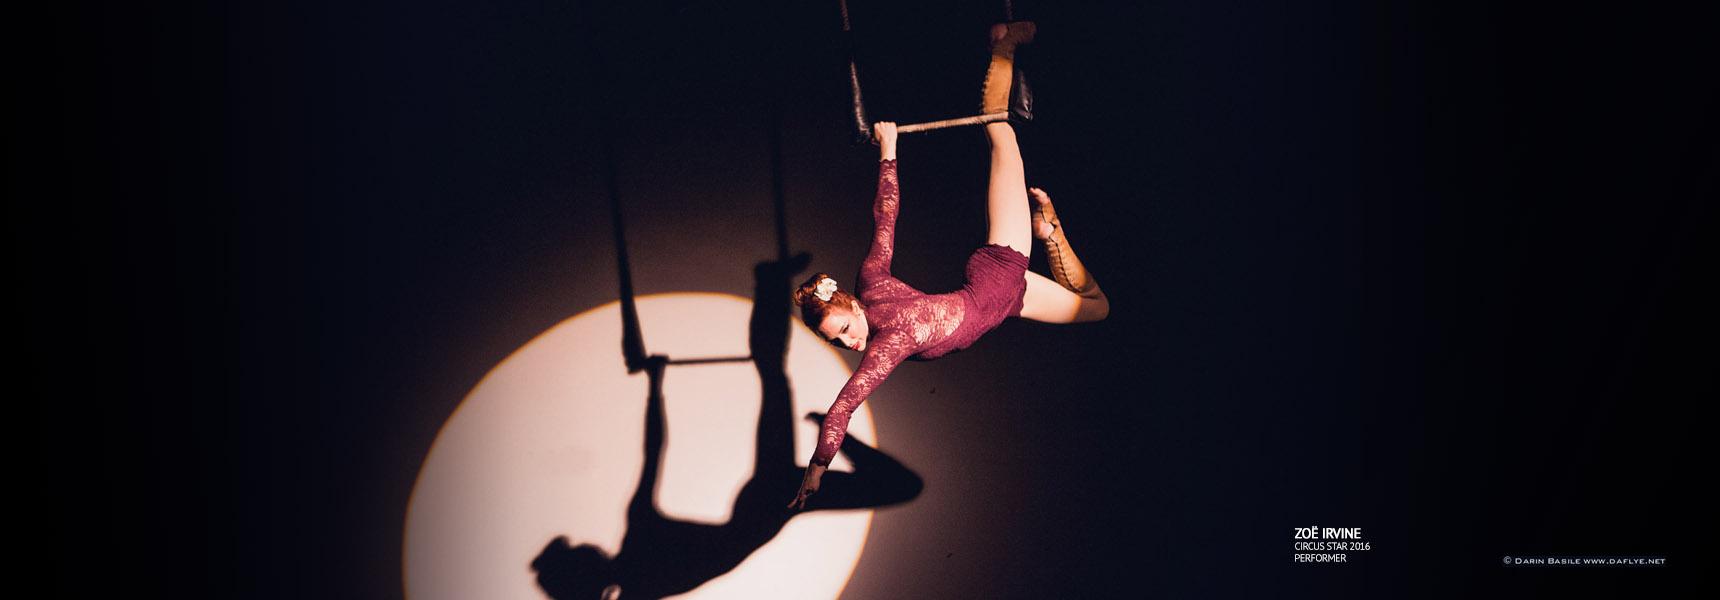 Zoë Irvine, Circus Star USA 2016 performer